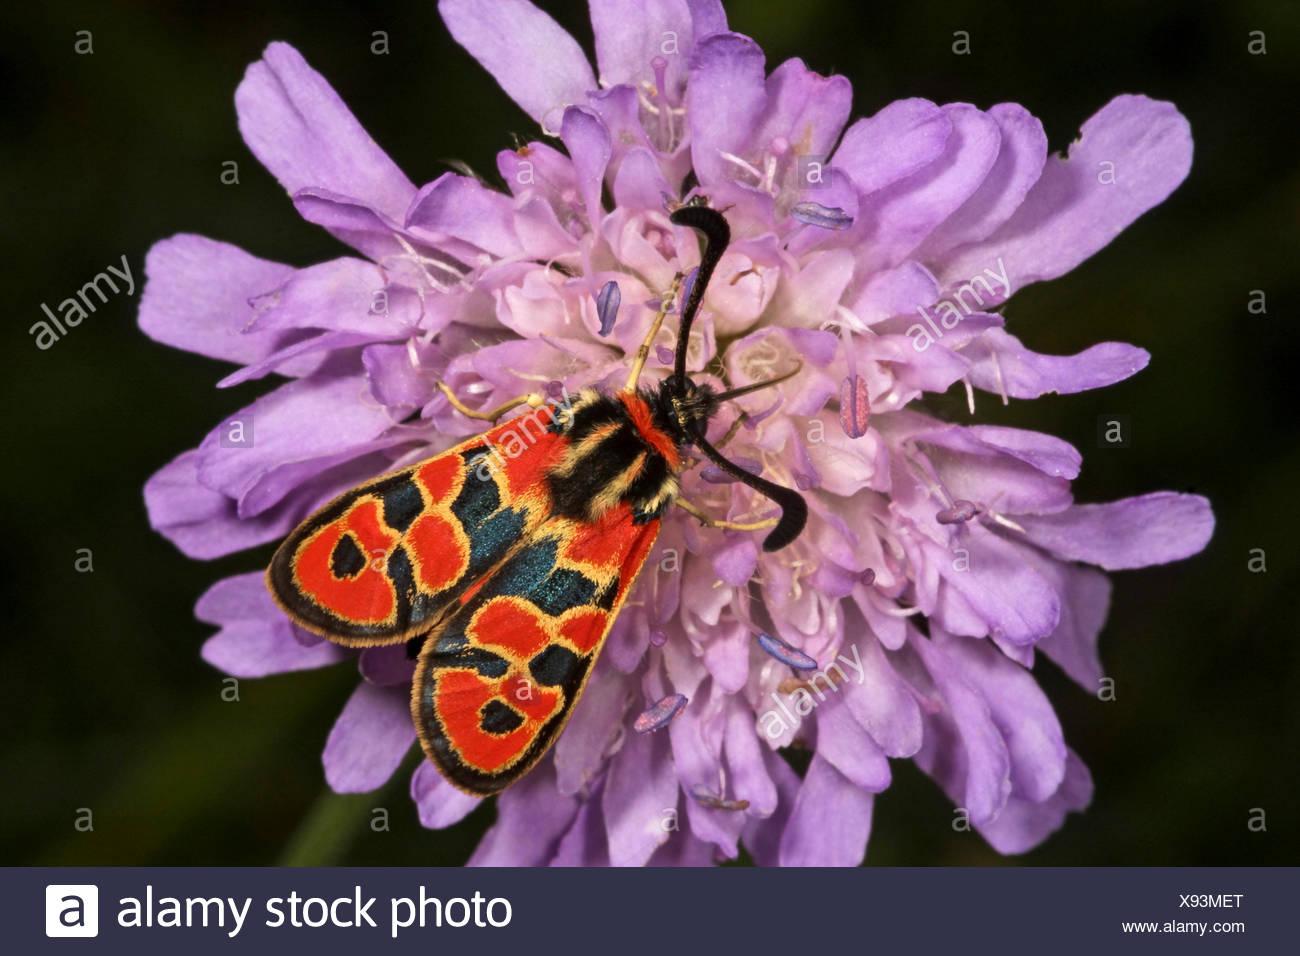 Auspicious Burnet Moth (Zygaena fausta, Zygaena faustina), on a scabious flower, Germany - Stock Image